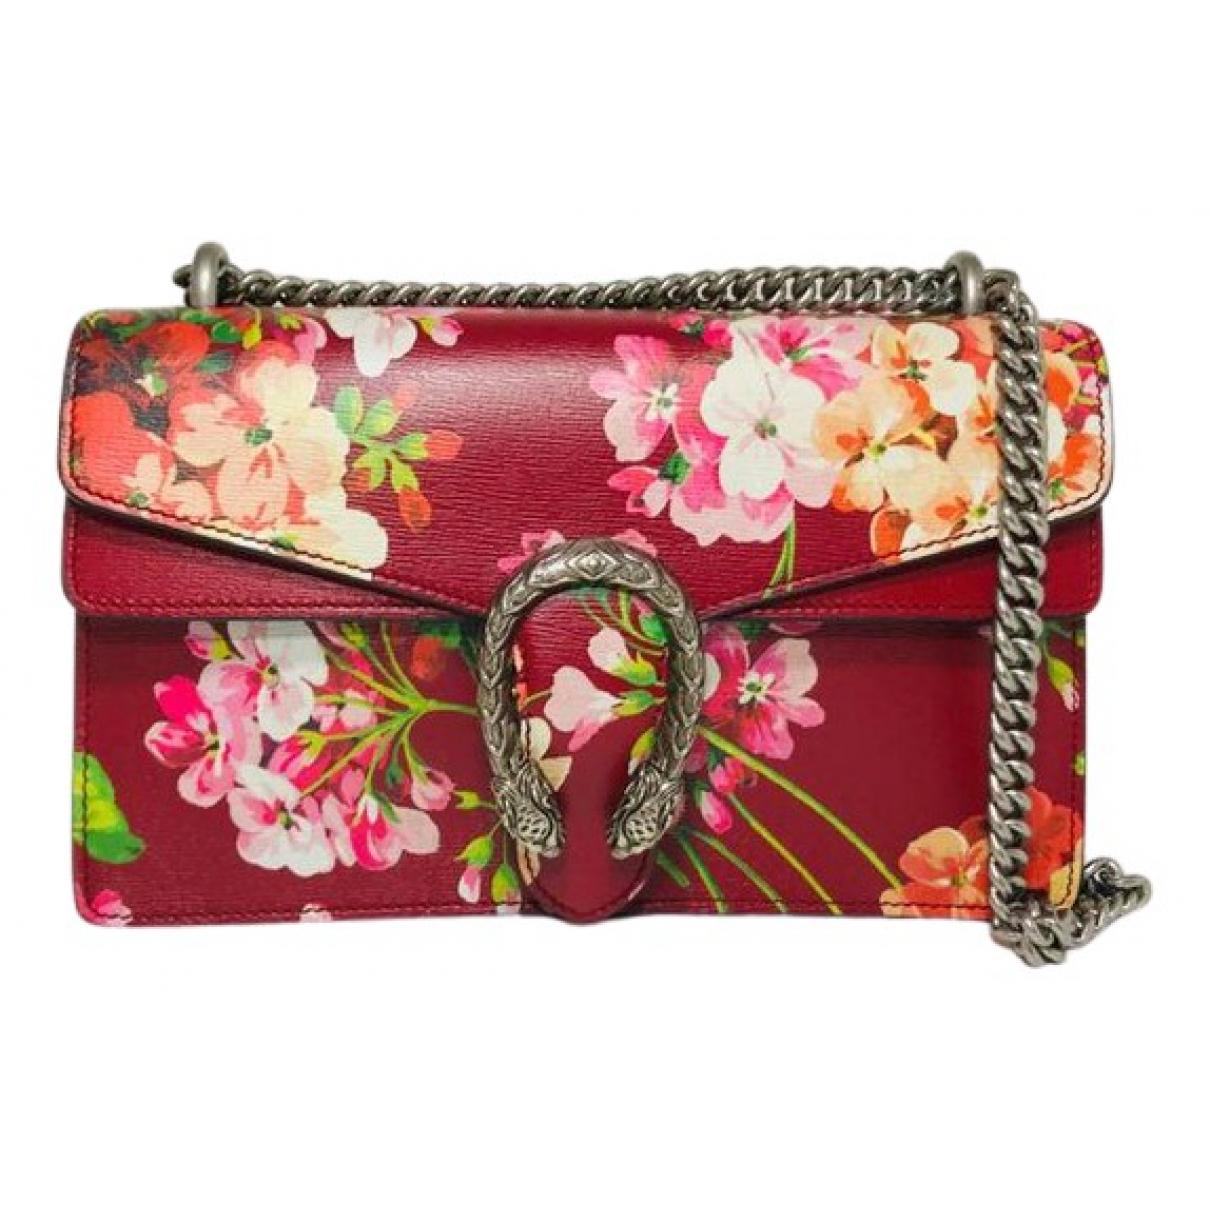 Gucci Dionysus Handtasche in  Bunt Leder